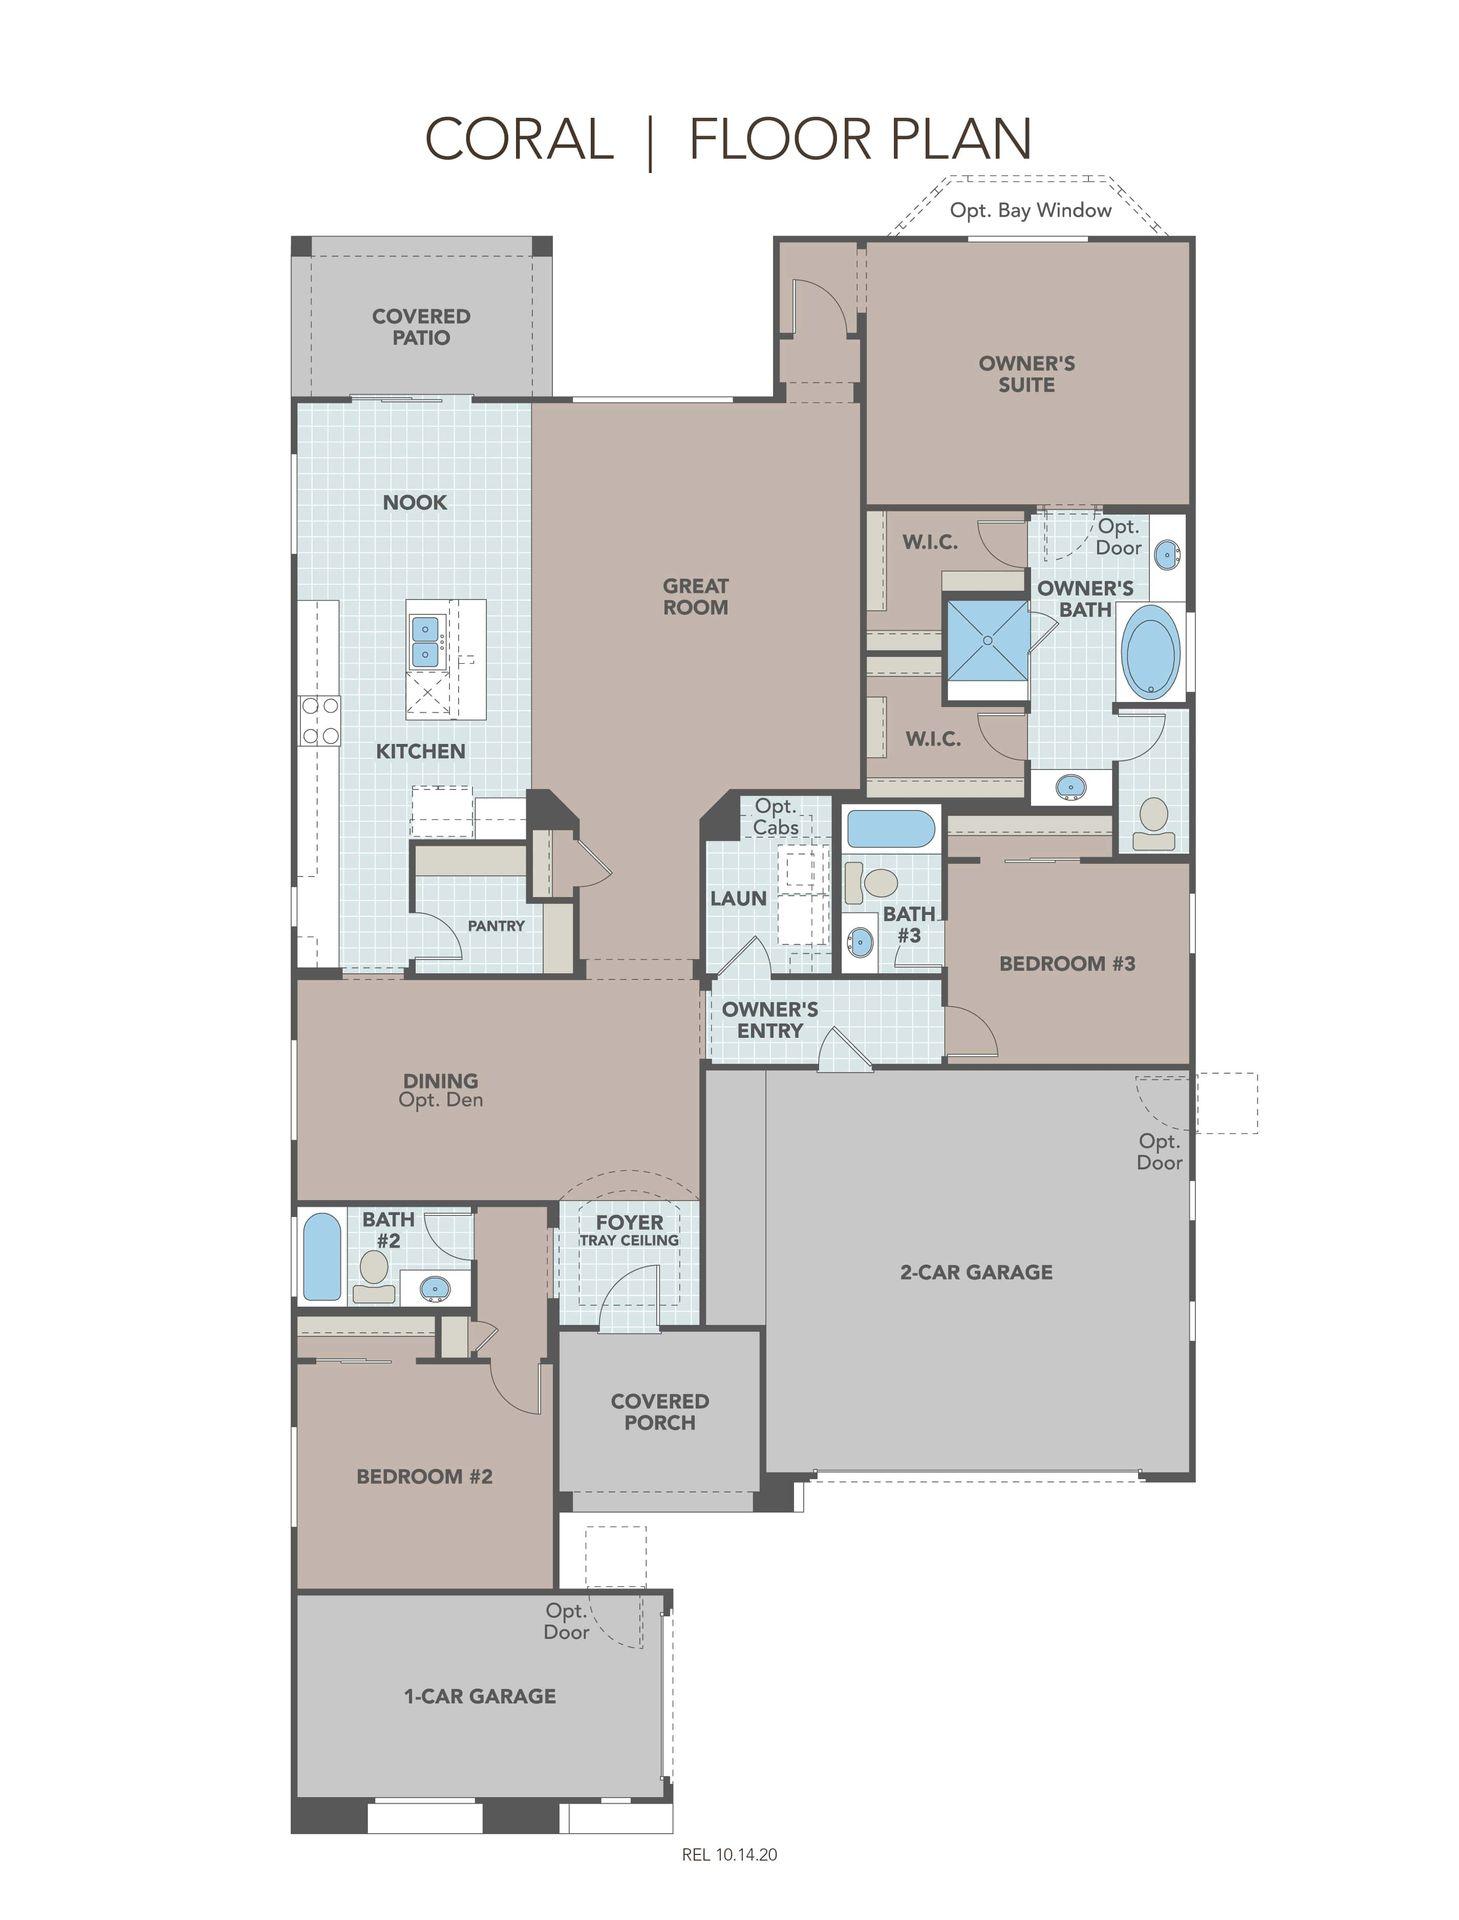 Hacienda Series - Coral Plan